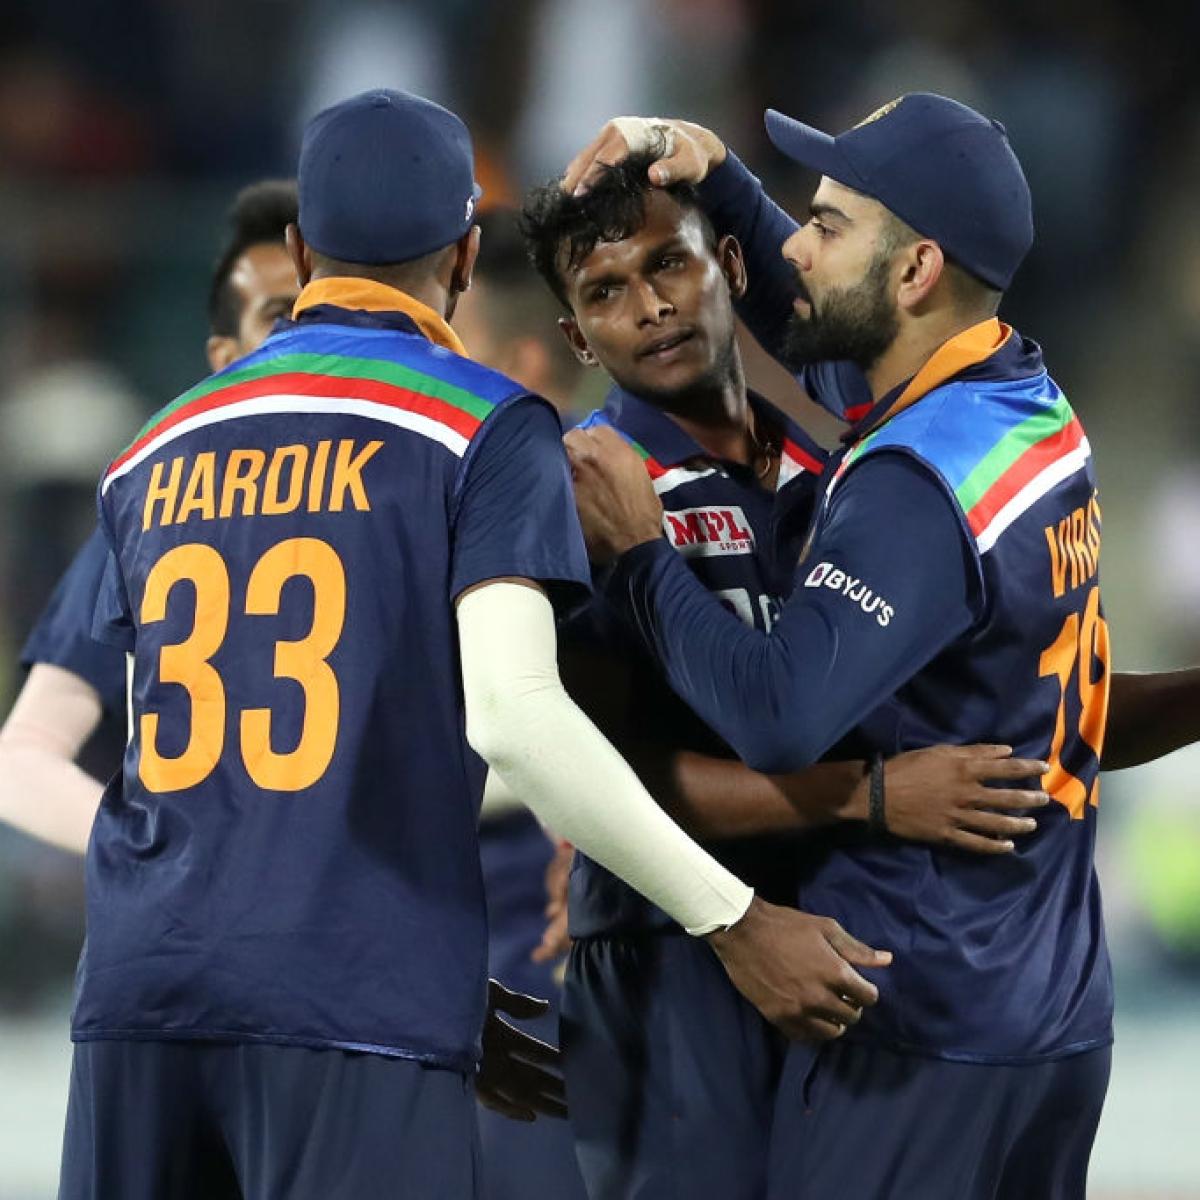 Ind vs Aus 1st T20I: Chahal, Natarajan take over after Jadeja's show to register 11-run win